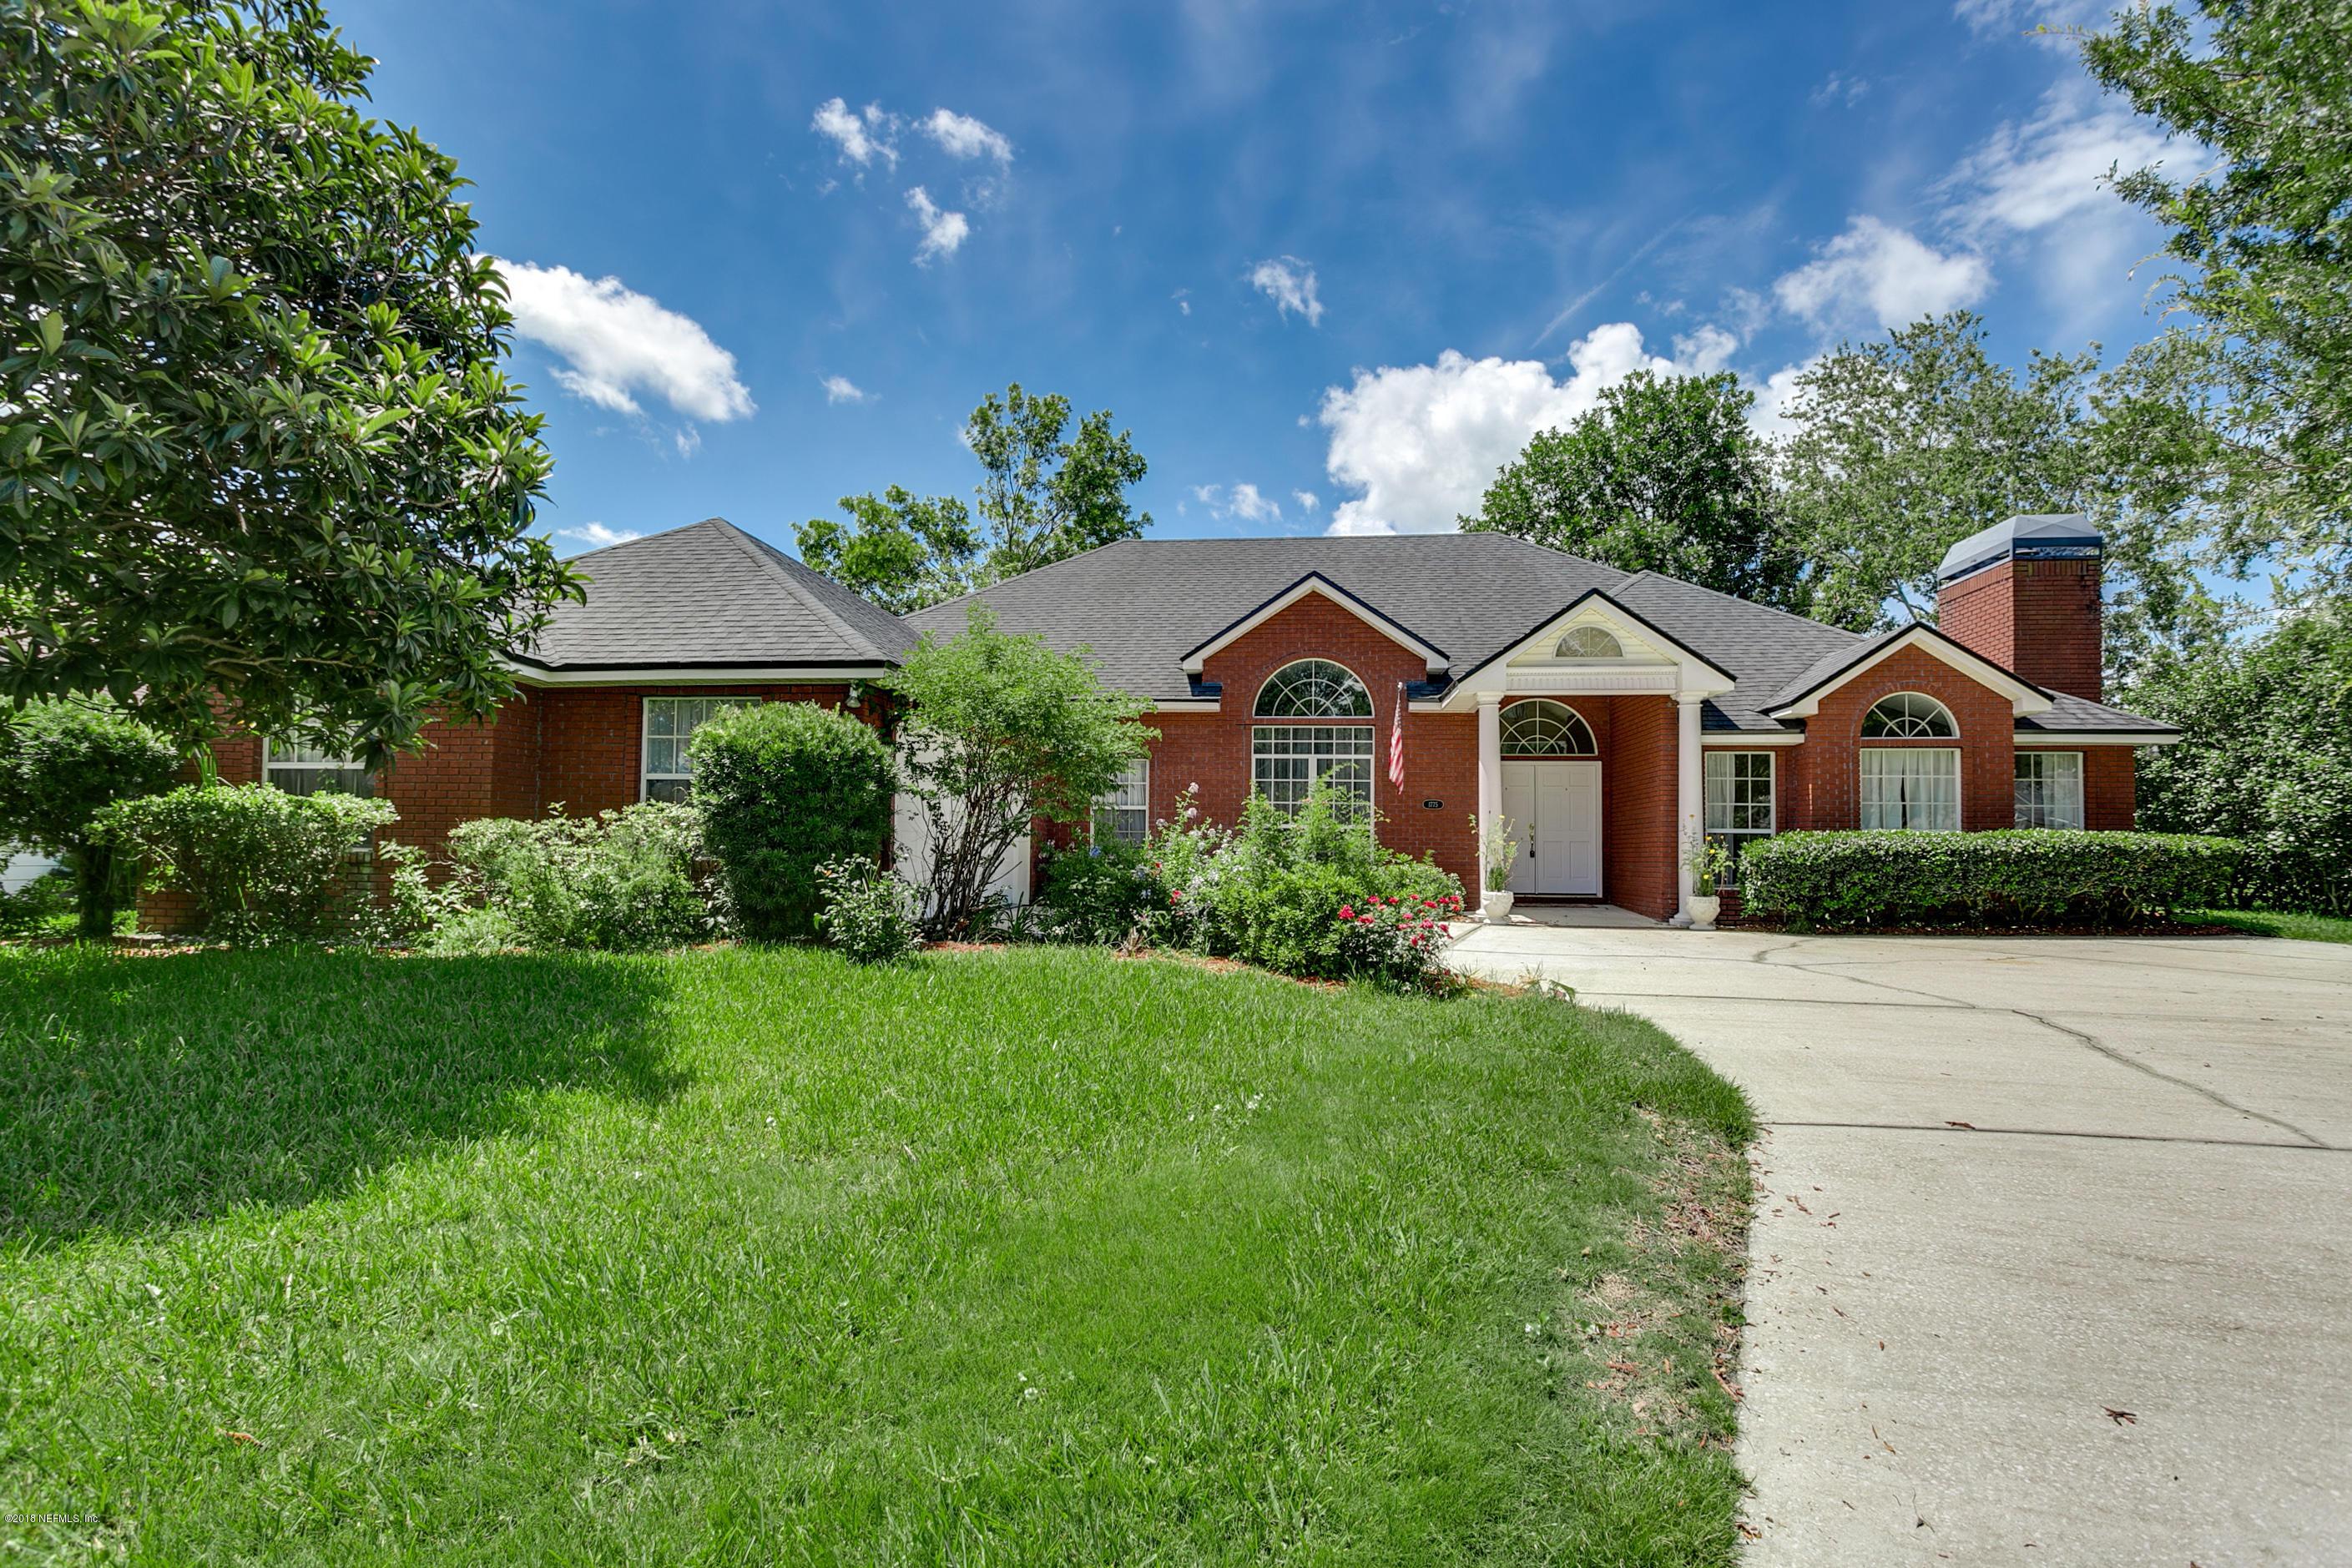 1775 BUTTONBUSH, ORANGE PARK, FLORIDA 32003, 5 Bedrooms Bedrooms, ,3 BathroomsBathrooms,Residential - single family,For sale,BUTTONBUSH,941860